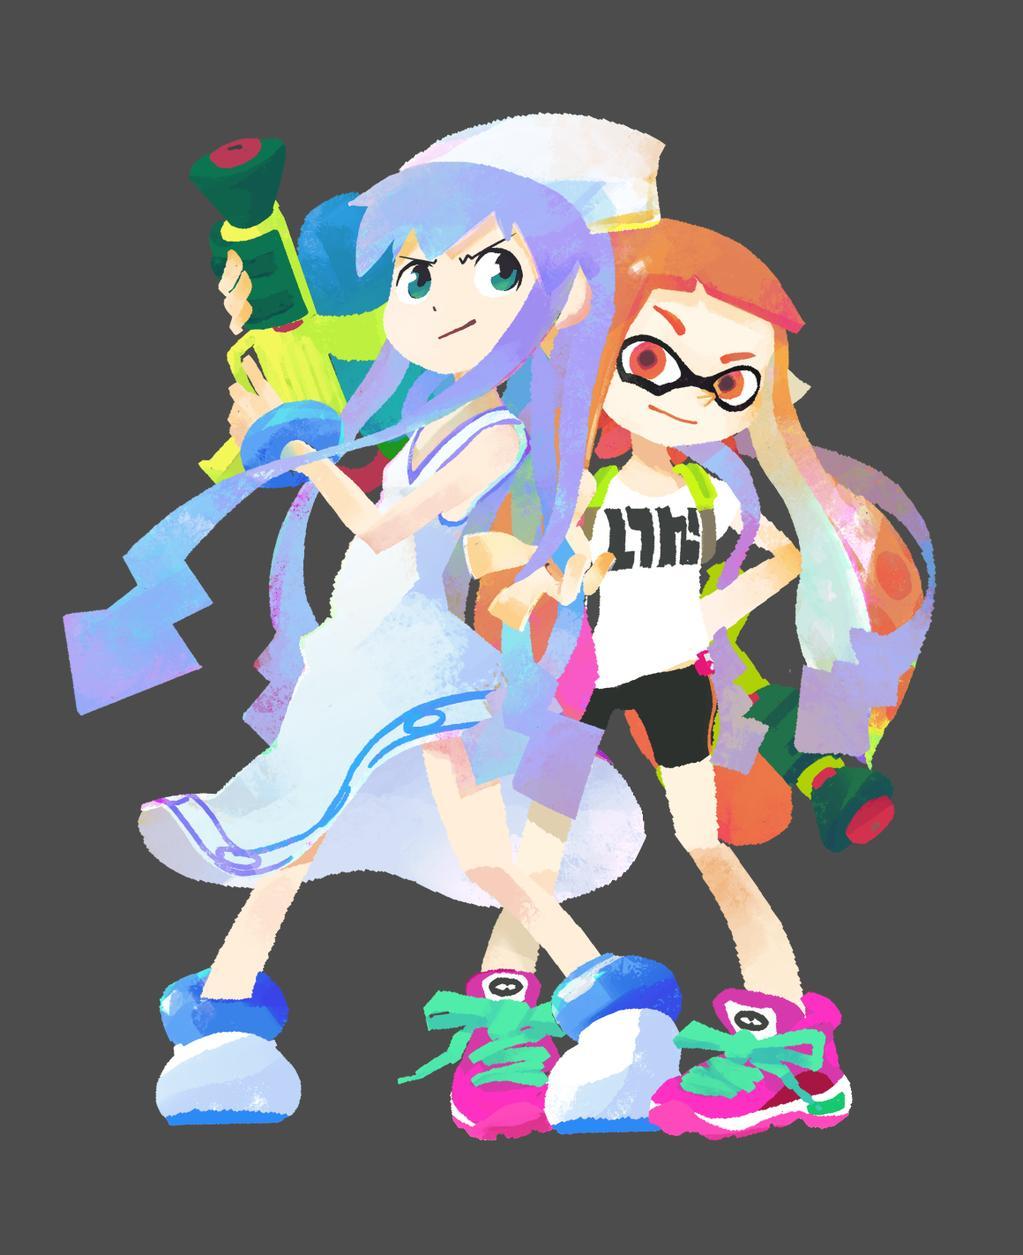 Squid Girl X Splatoon Crossover Art Masahiro Anbe Nintendo 2